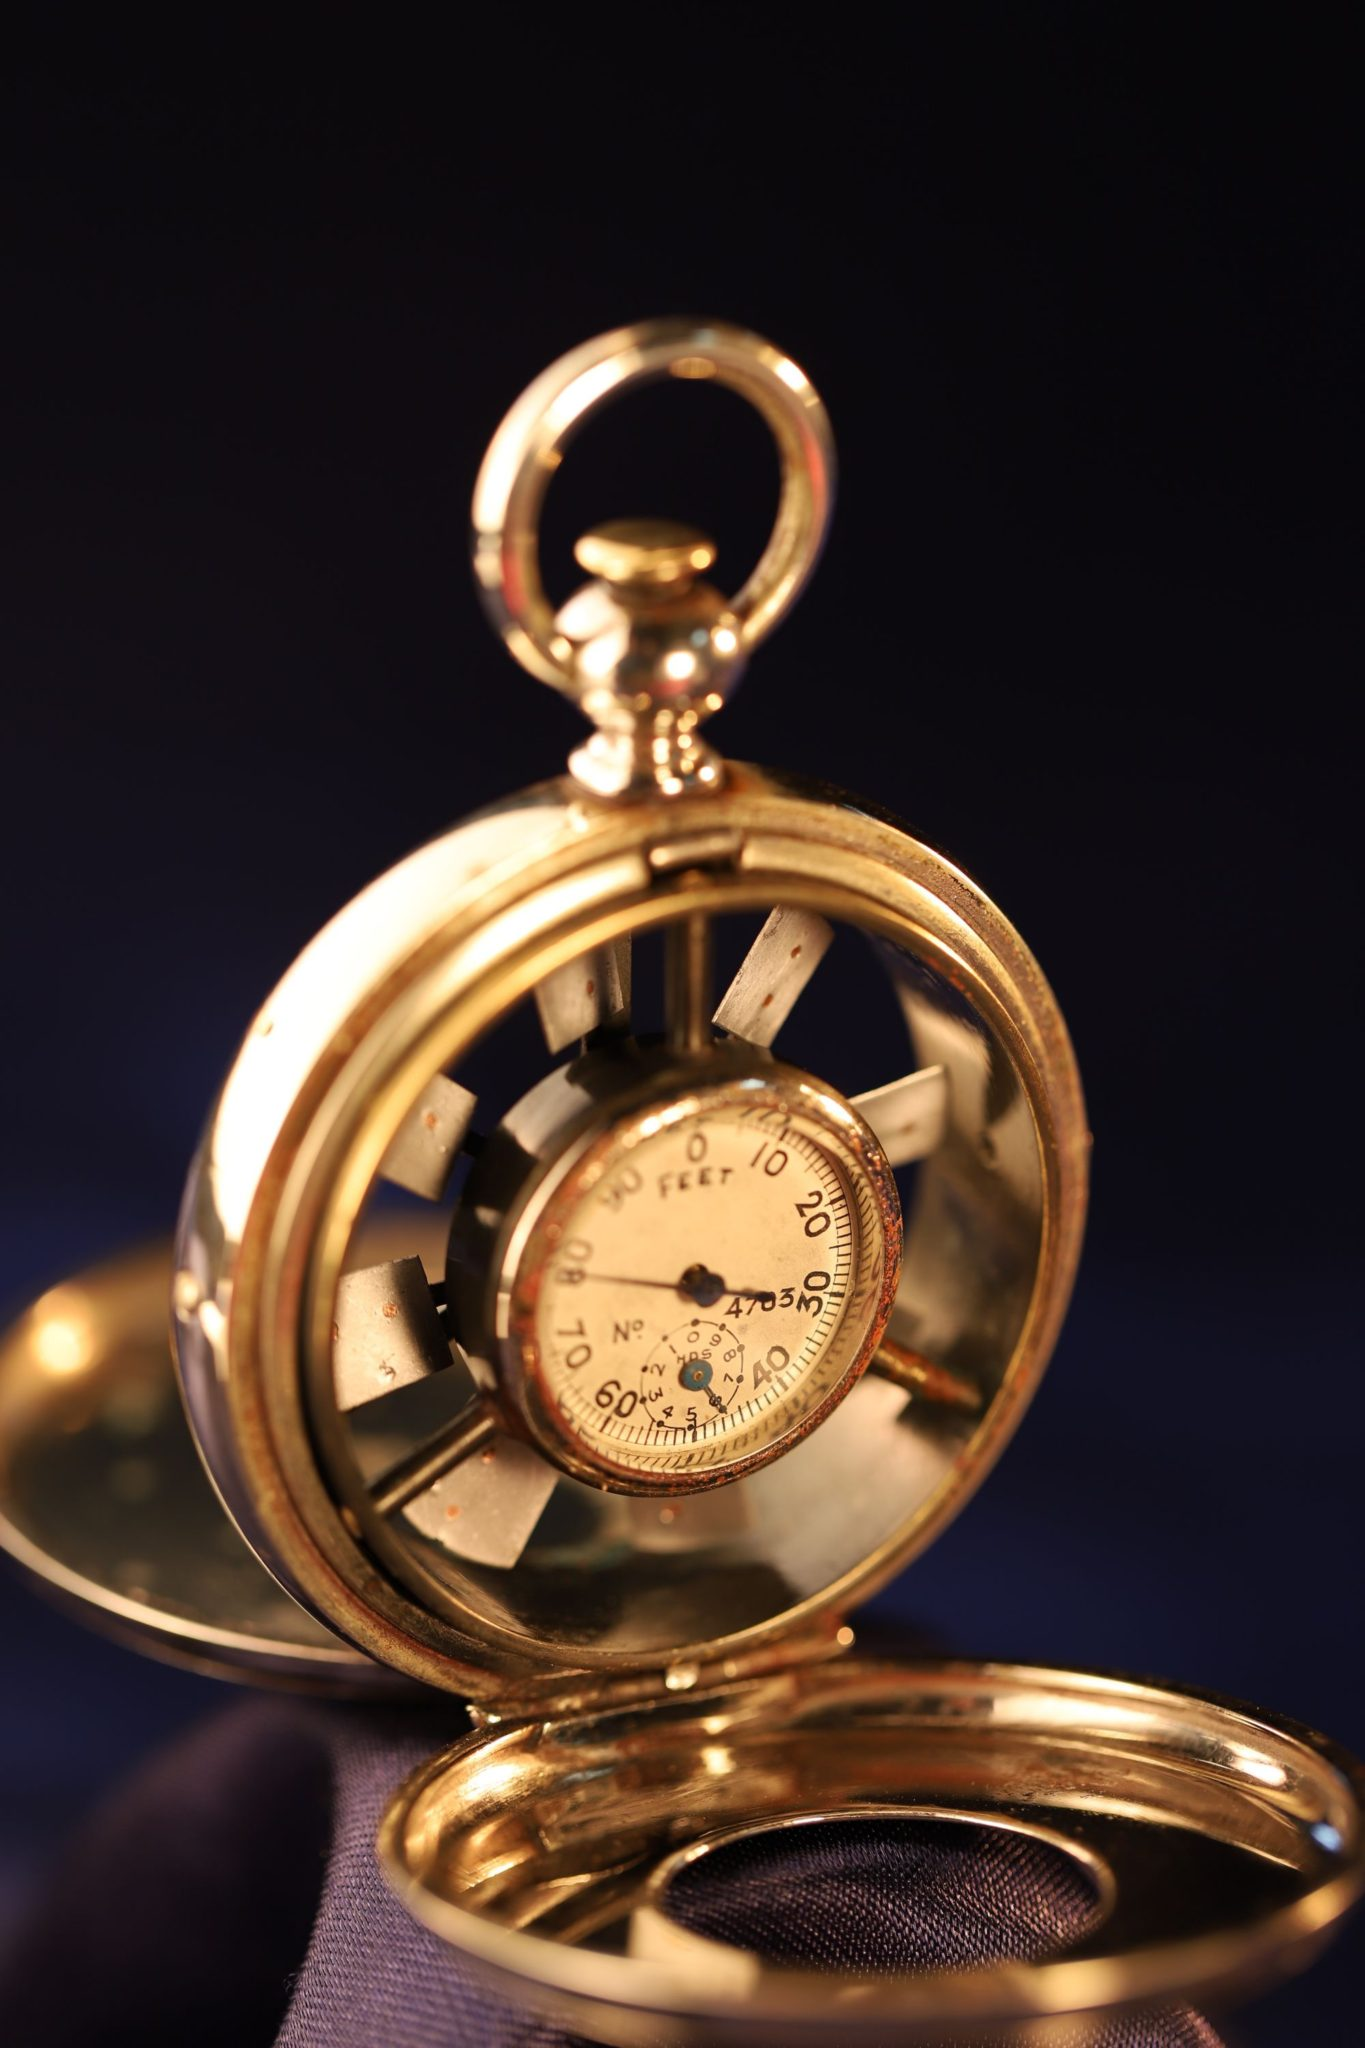 Image of Pocket Anemometer No 4703 by Schaeffer & Budenberg c1910